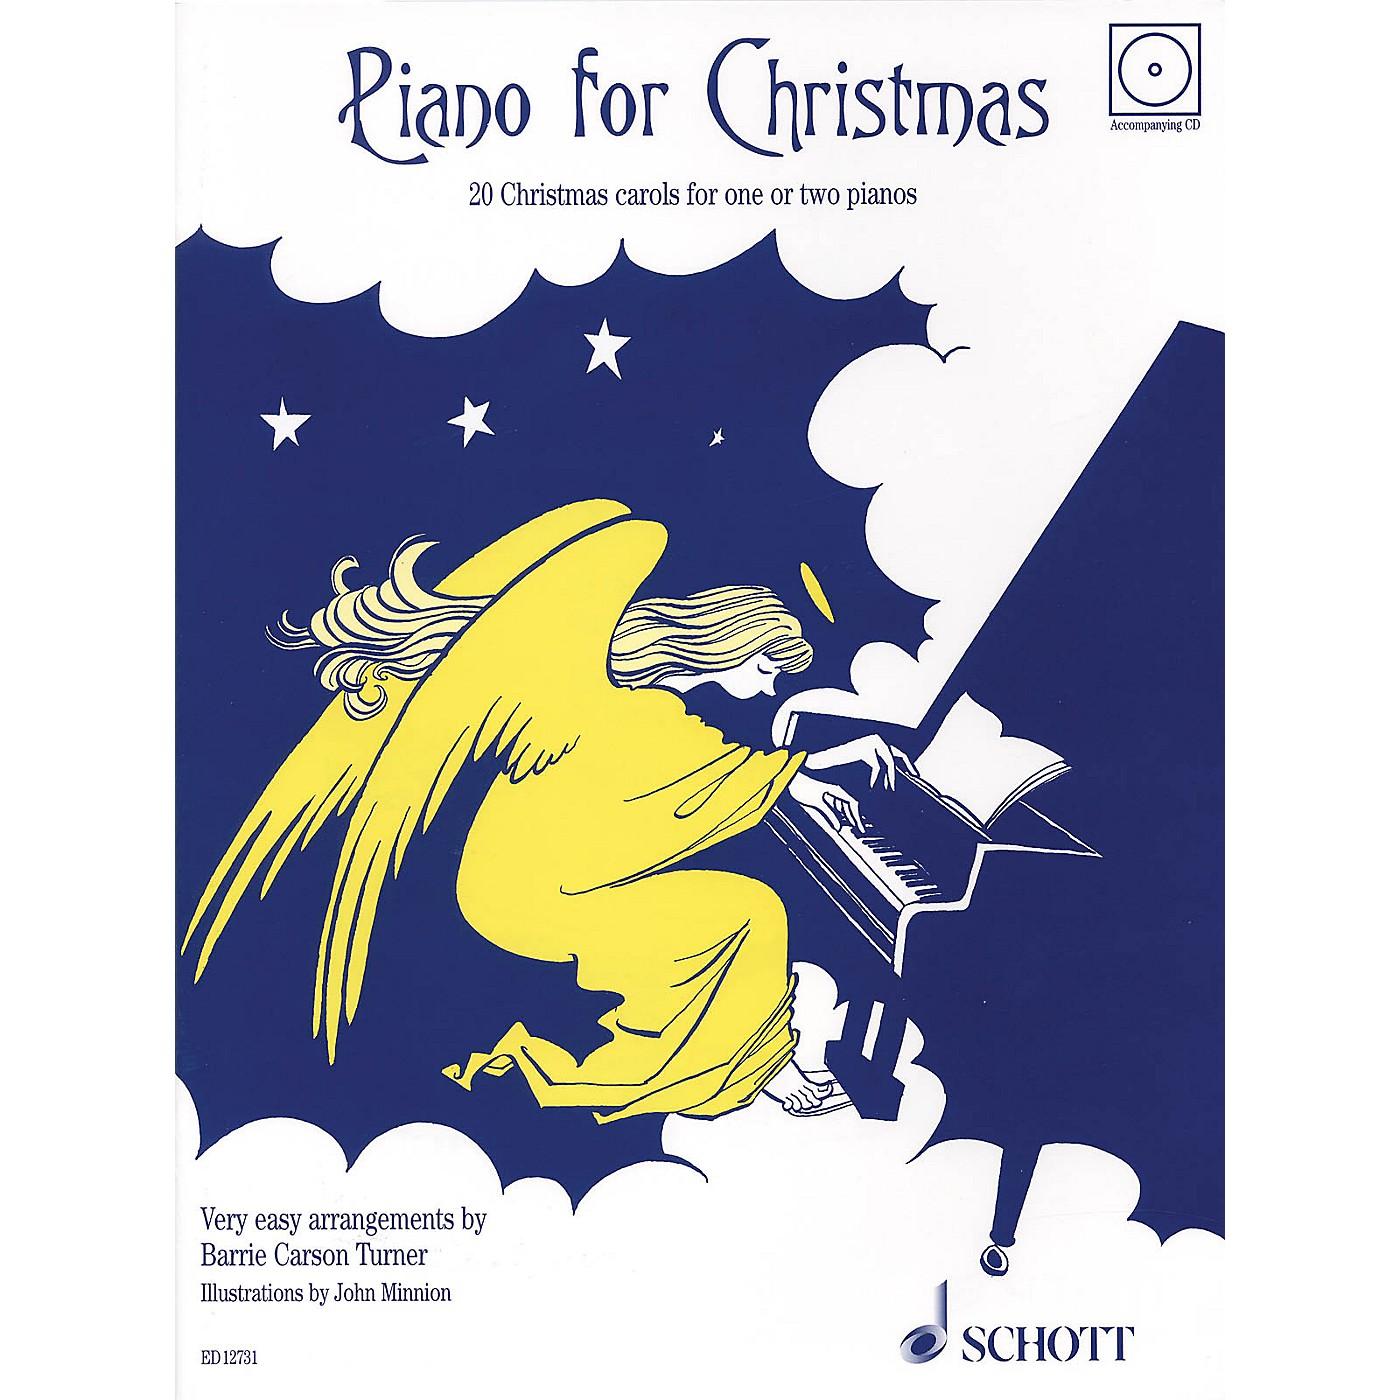 Schott Piano for Christmas (20 Christmas Carols for 1 or 2 Pianos) Schott Series thumbnail